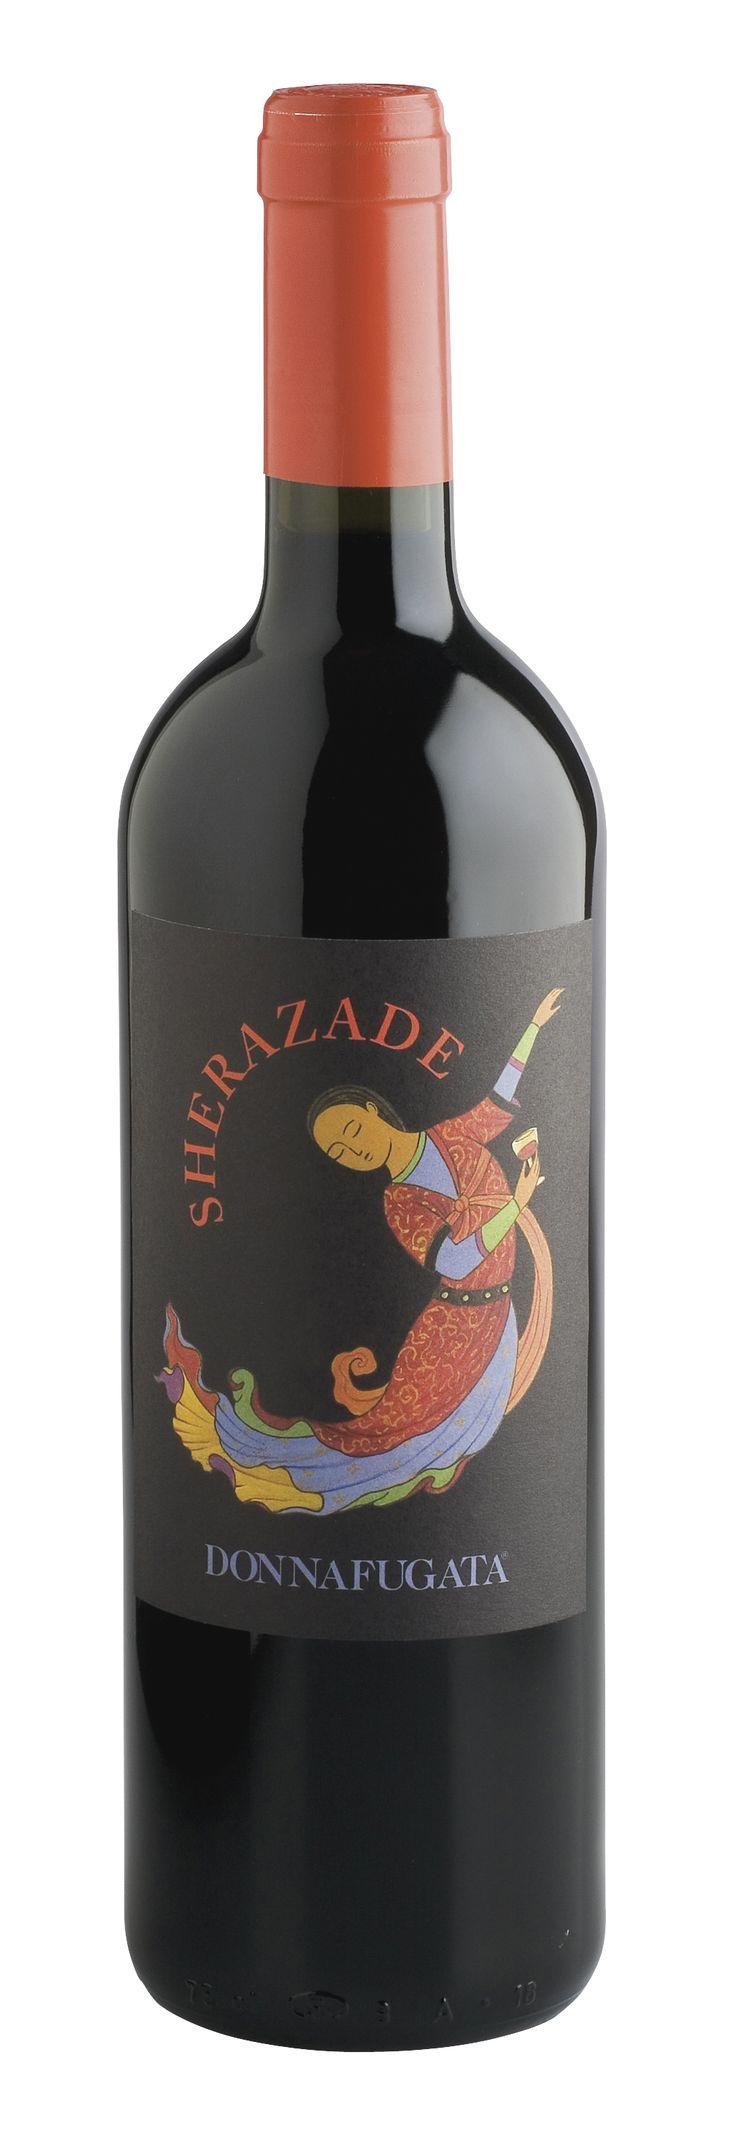 Sherazade bottiglia